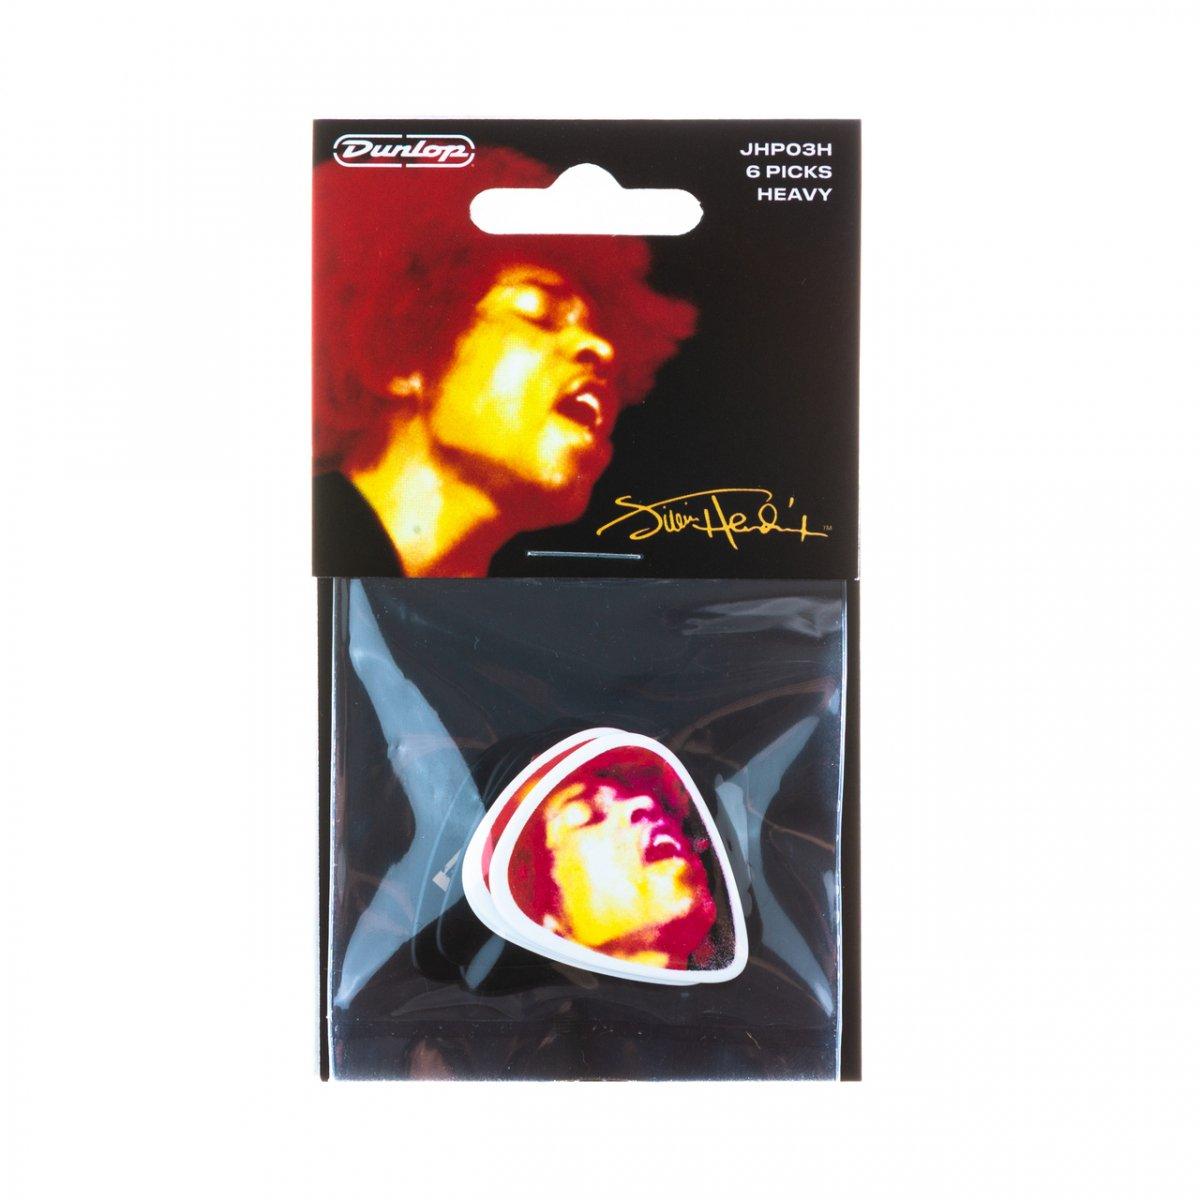 Медіатори Dunlop JHP03H Jimi Hendrix AELECTRIC LADYLAND PICK